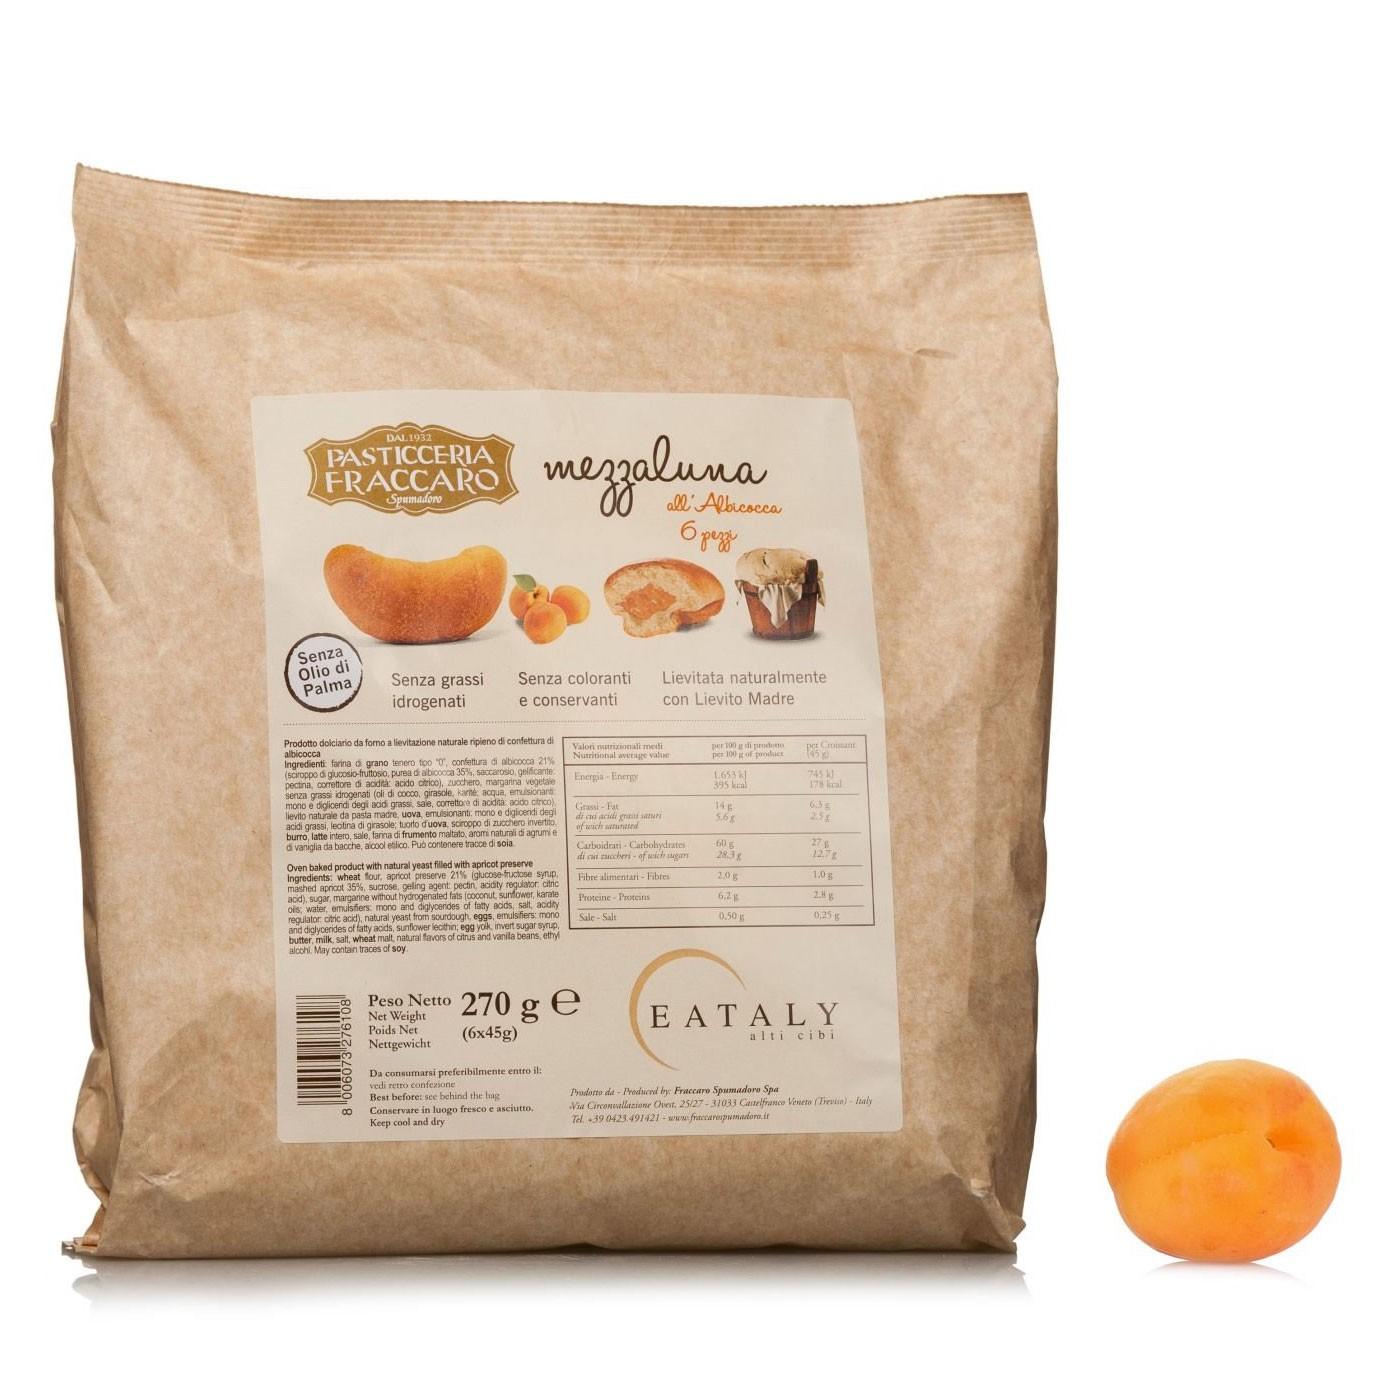 Apricot Mezzaluna Breakfast Pastries 9.54 oz - Fraccaro | Eataly.com